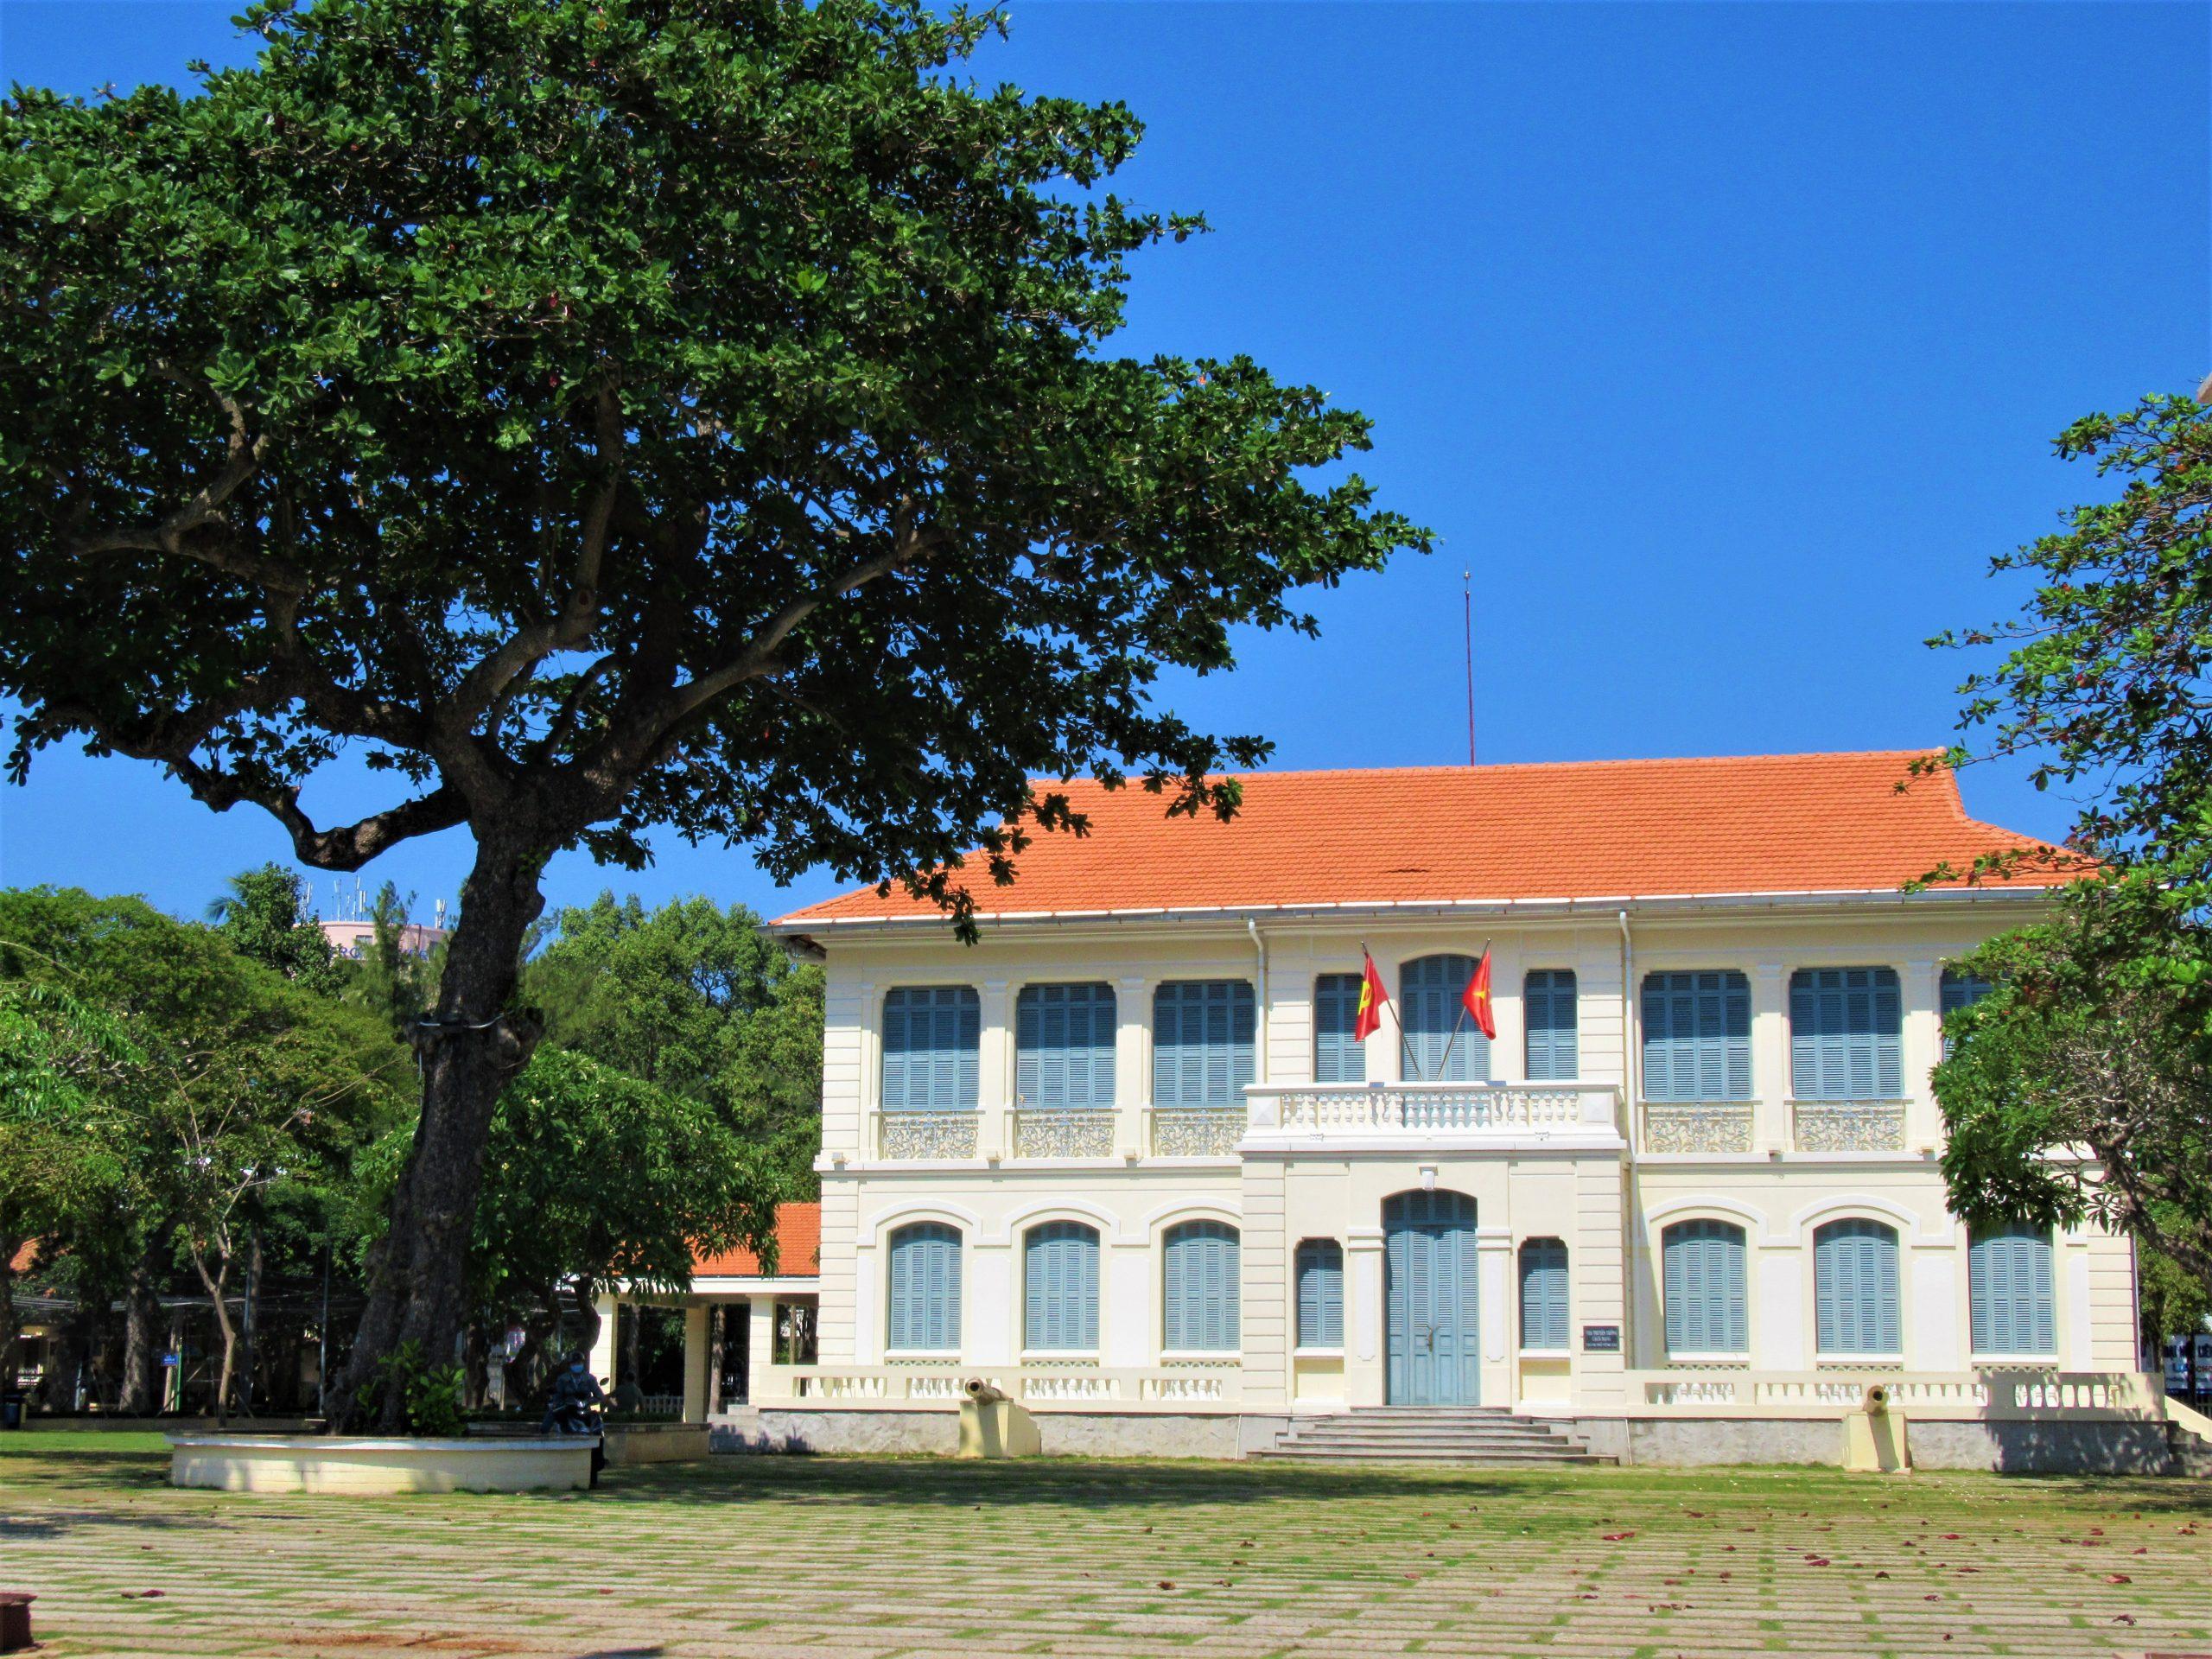 Bach Dinh Palace, Vung Tau, Vietnam